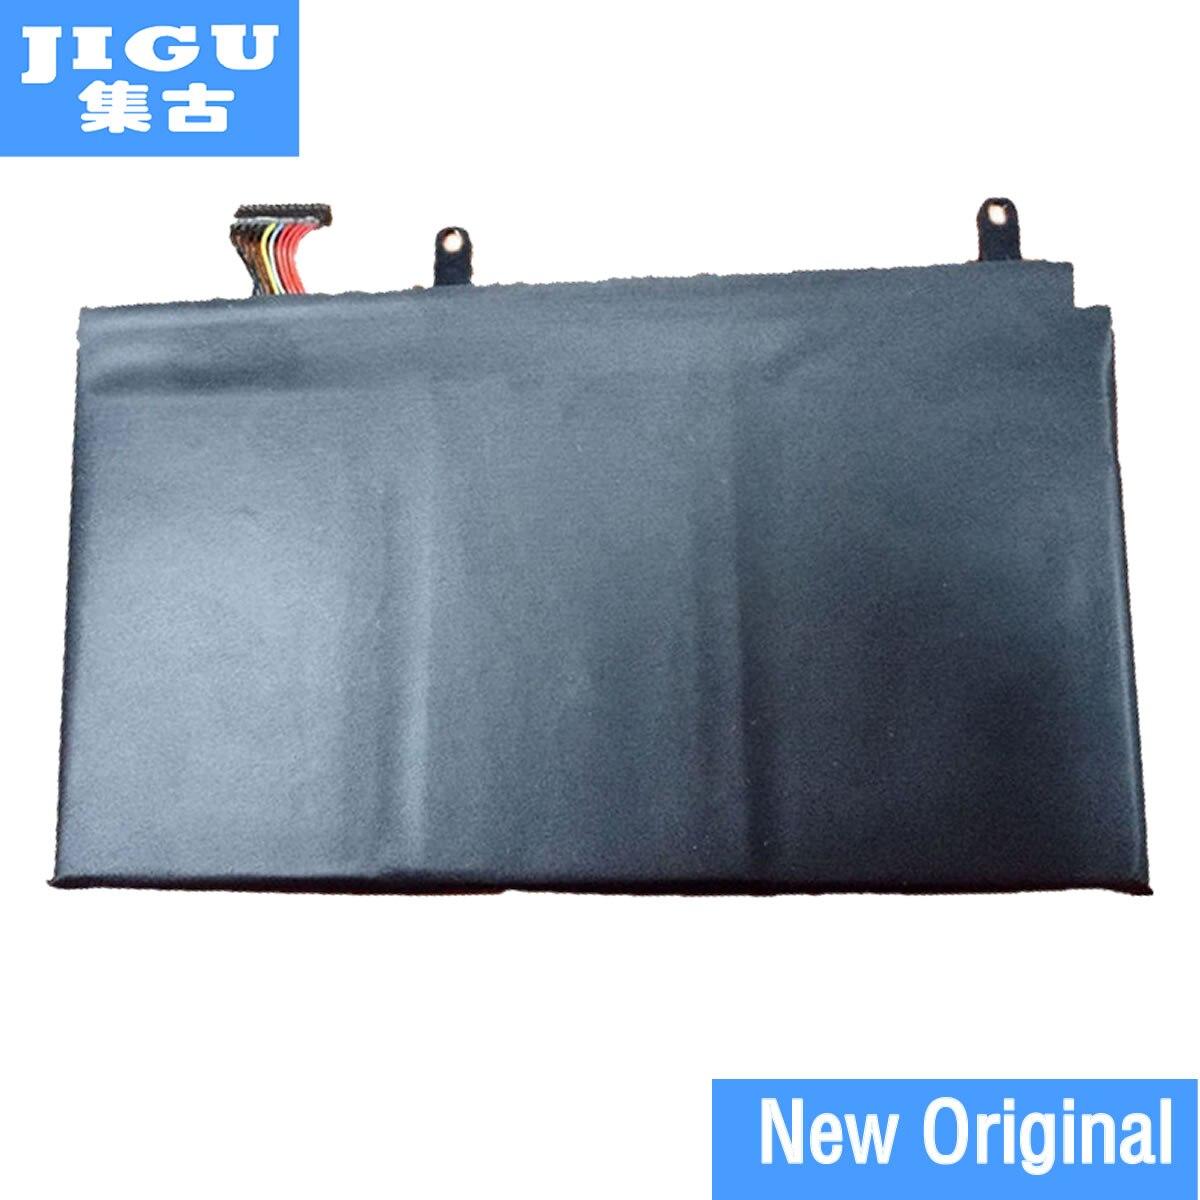 JIGU Original laptop Battery GNS-160 GNS-I60 961TA010FA FOR GIGABYTE P35G v2 P35K P35W v2 P35X v3 P37X v5 P57W P57X v6 laptop keyboard for gigabyte p35g v2 p35w p35w v3 p35x v3 p35k v2 v3 u35f black fr french